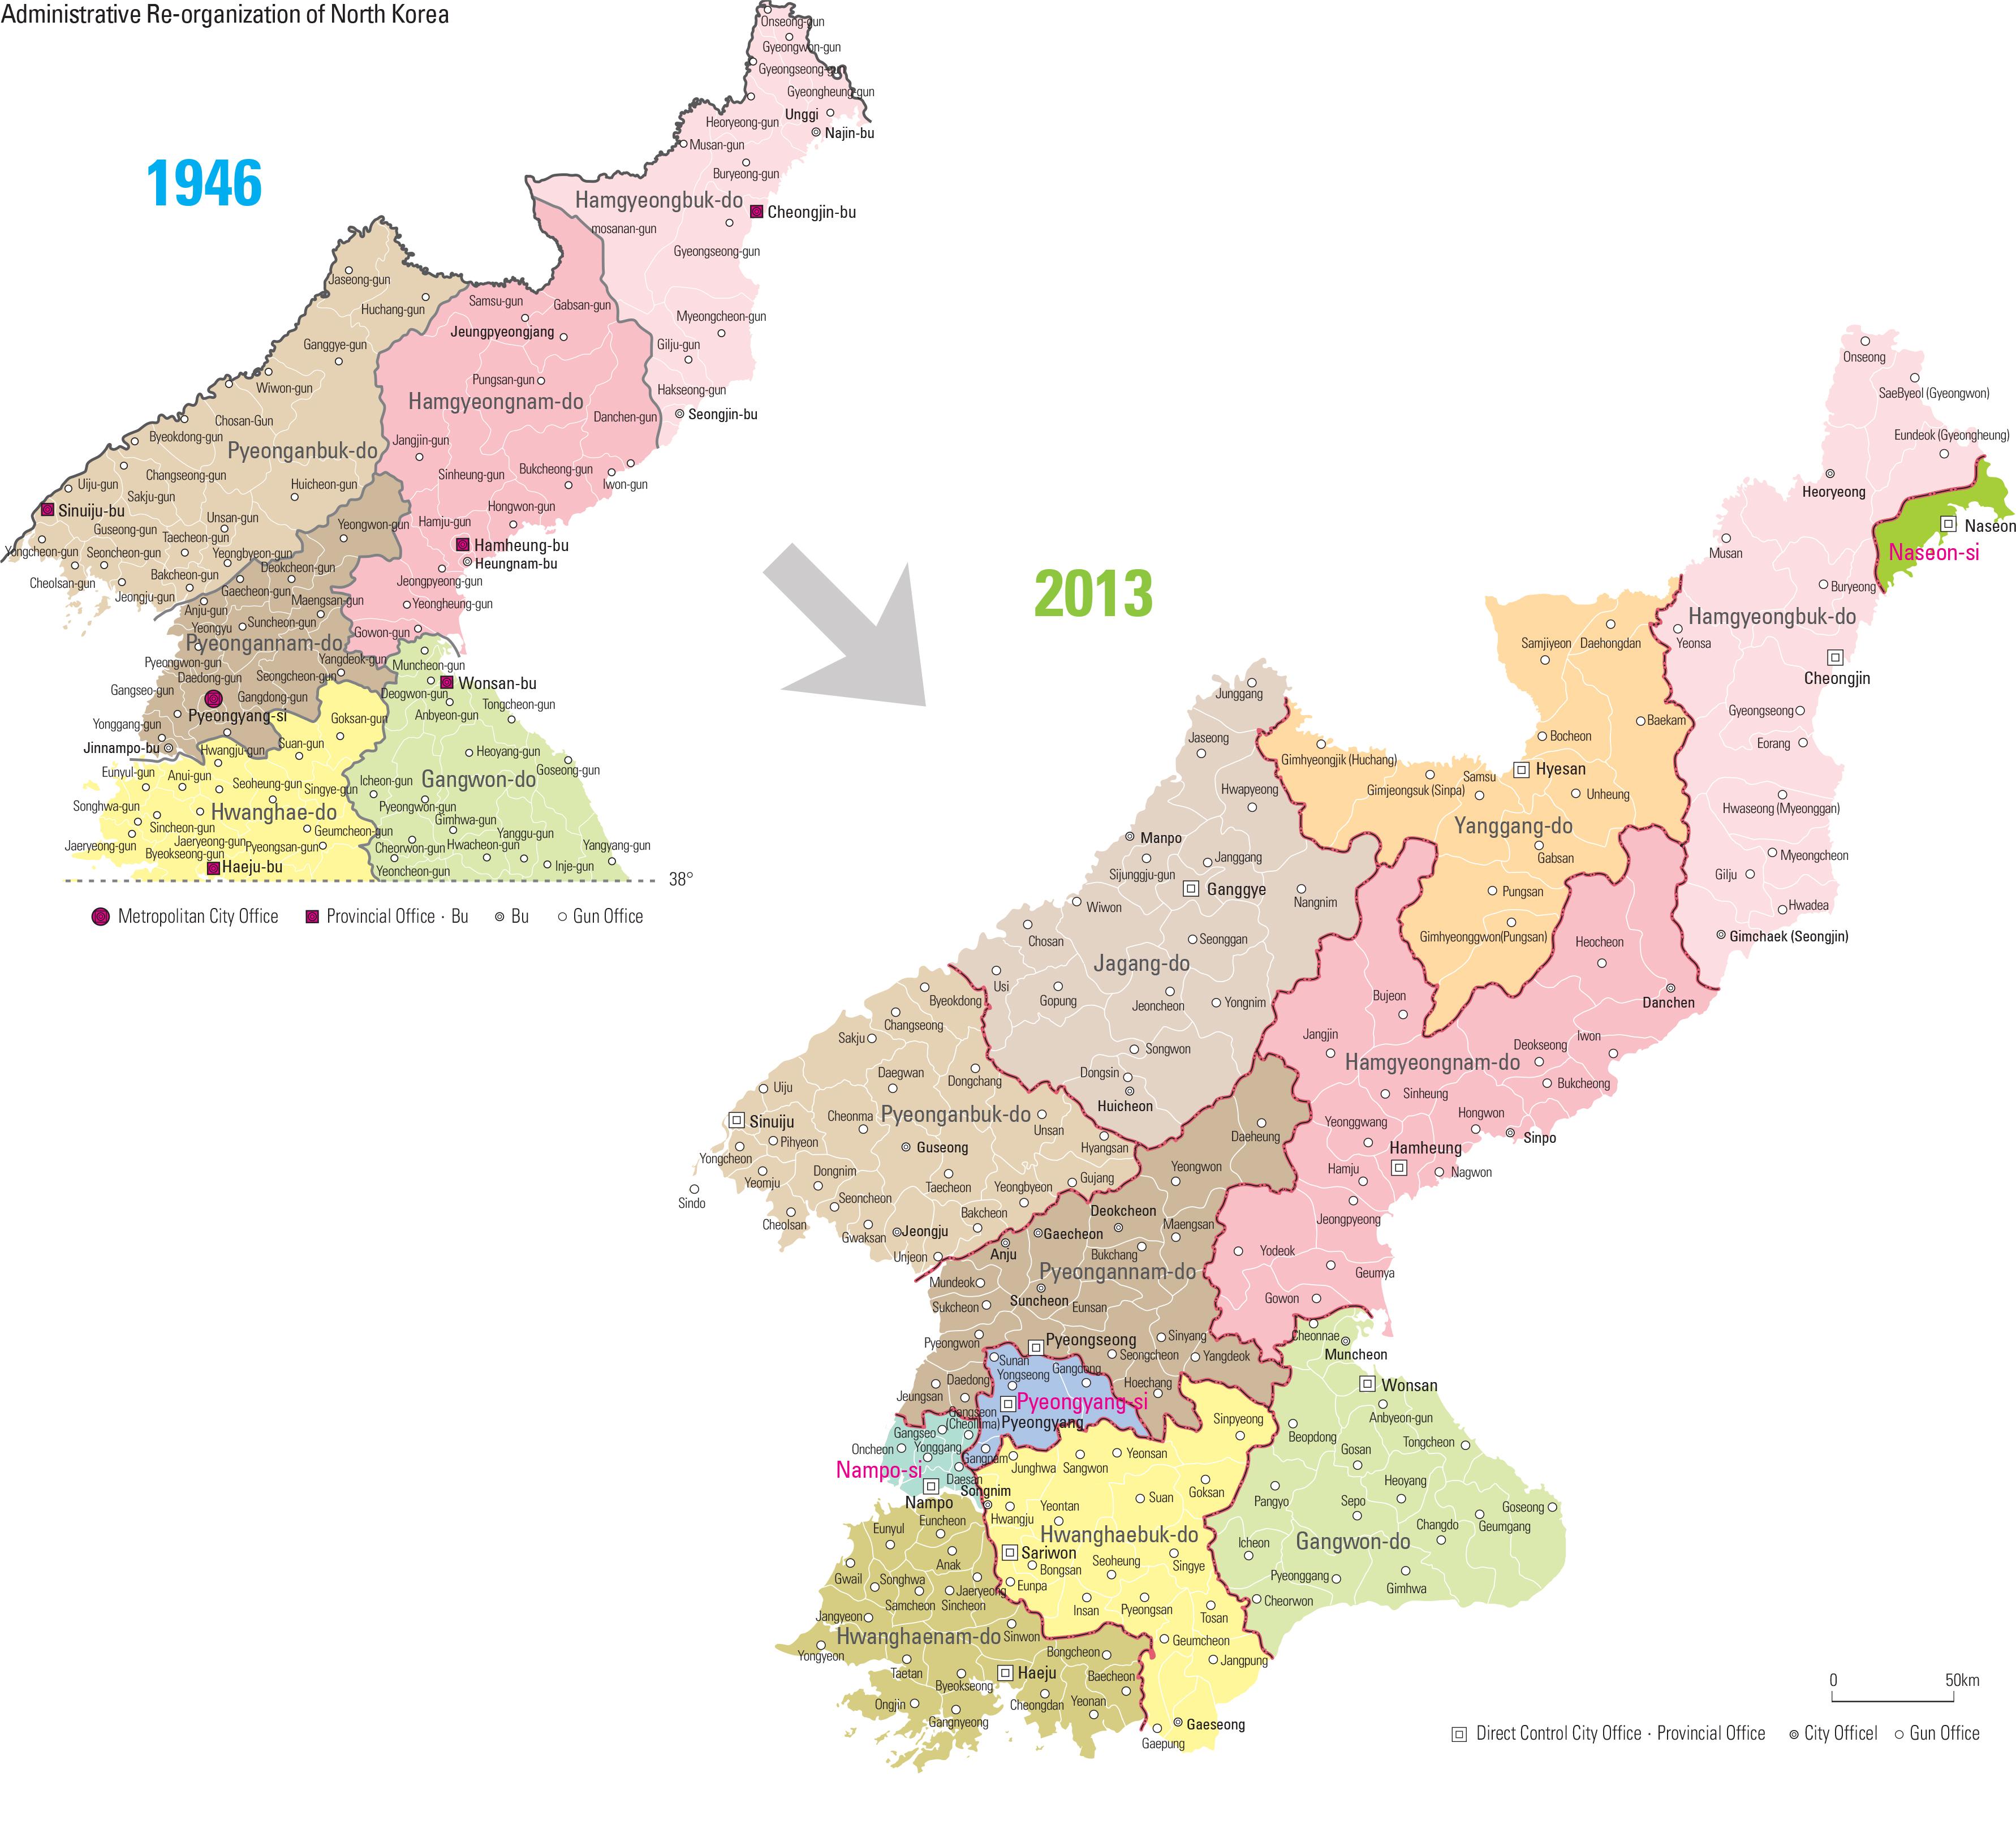 Administrative Re-organization of North Korea